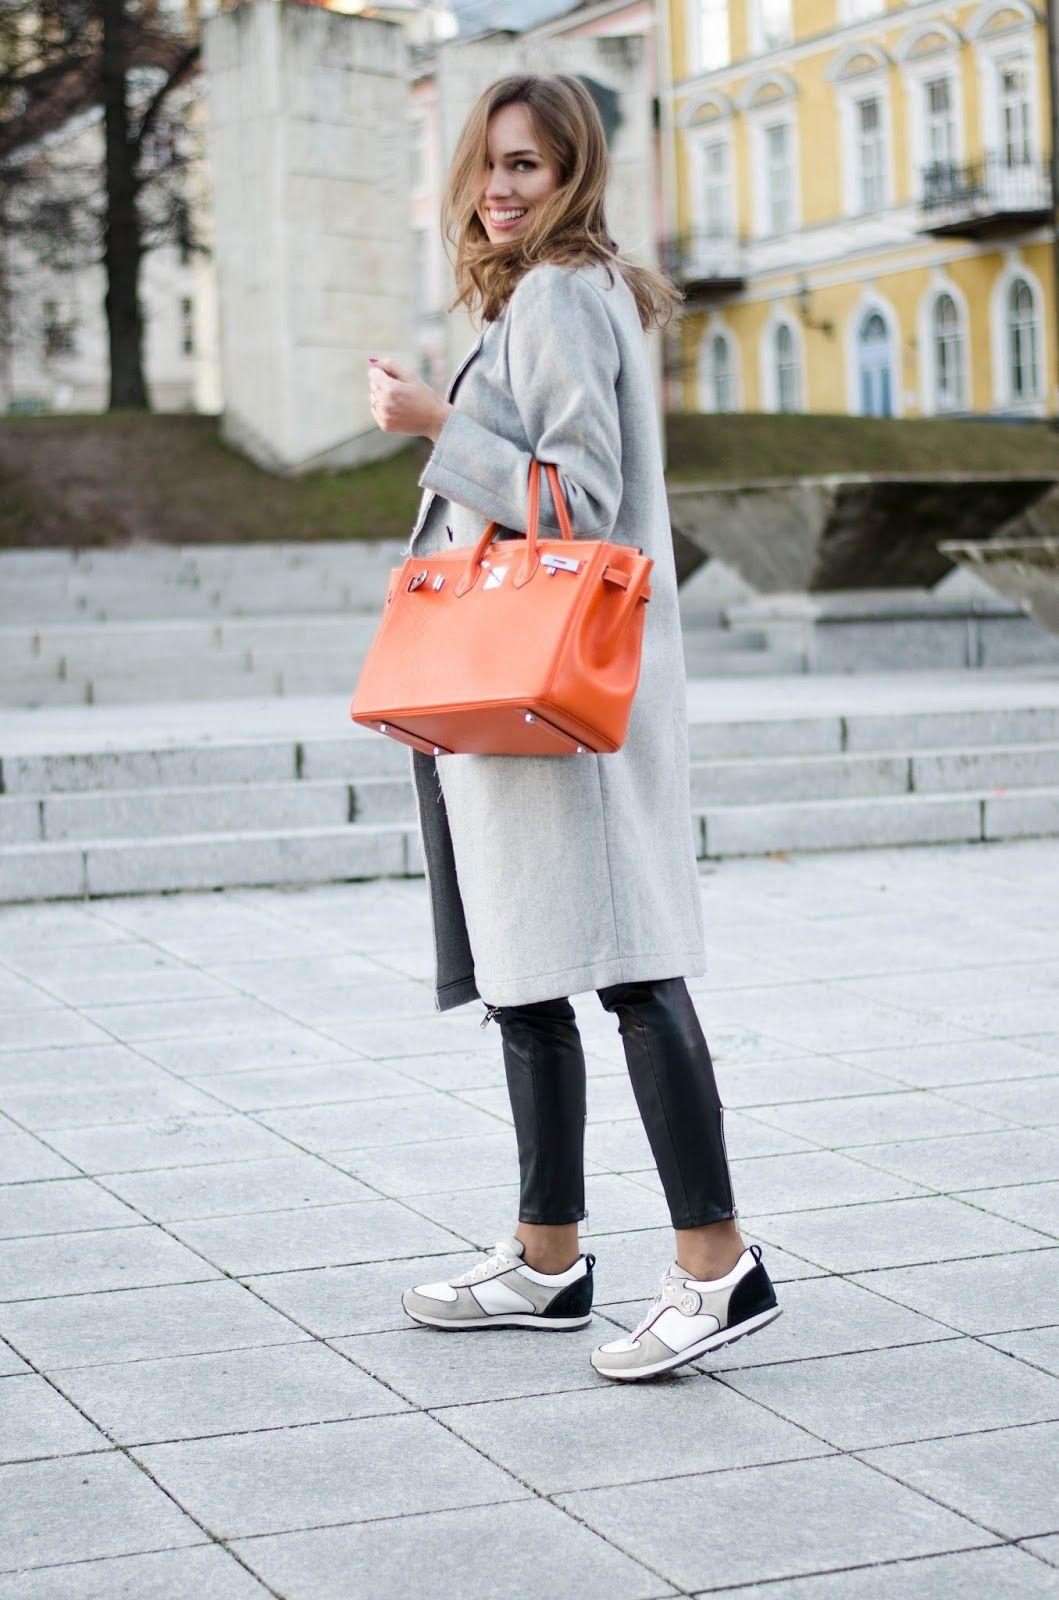 ccfbbce48edc kristjaana mere hermes birkin bag casual winter outfit coat sneakers ...